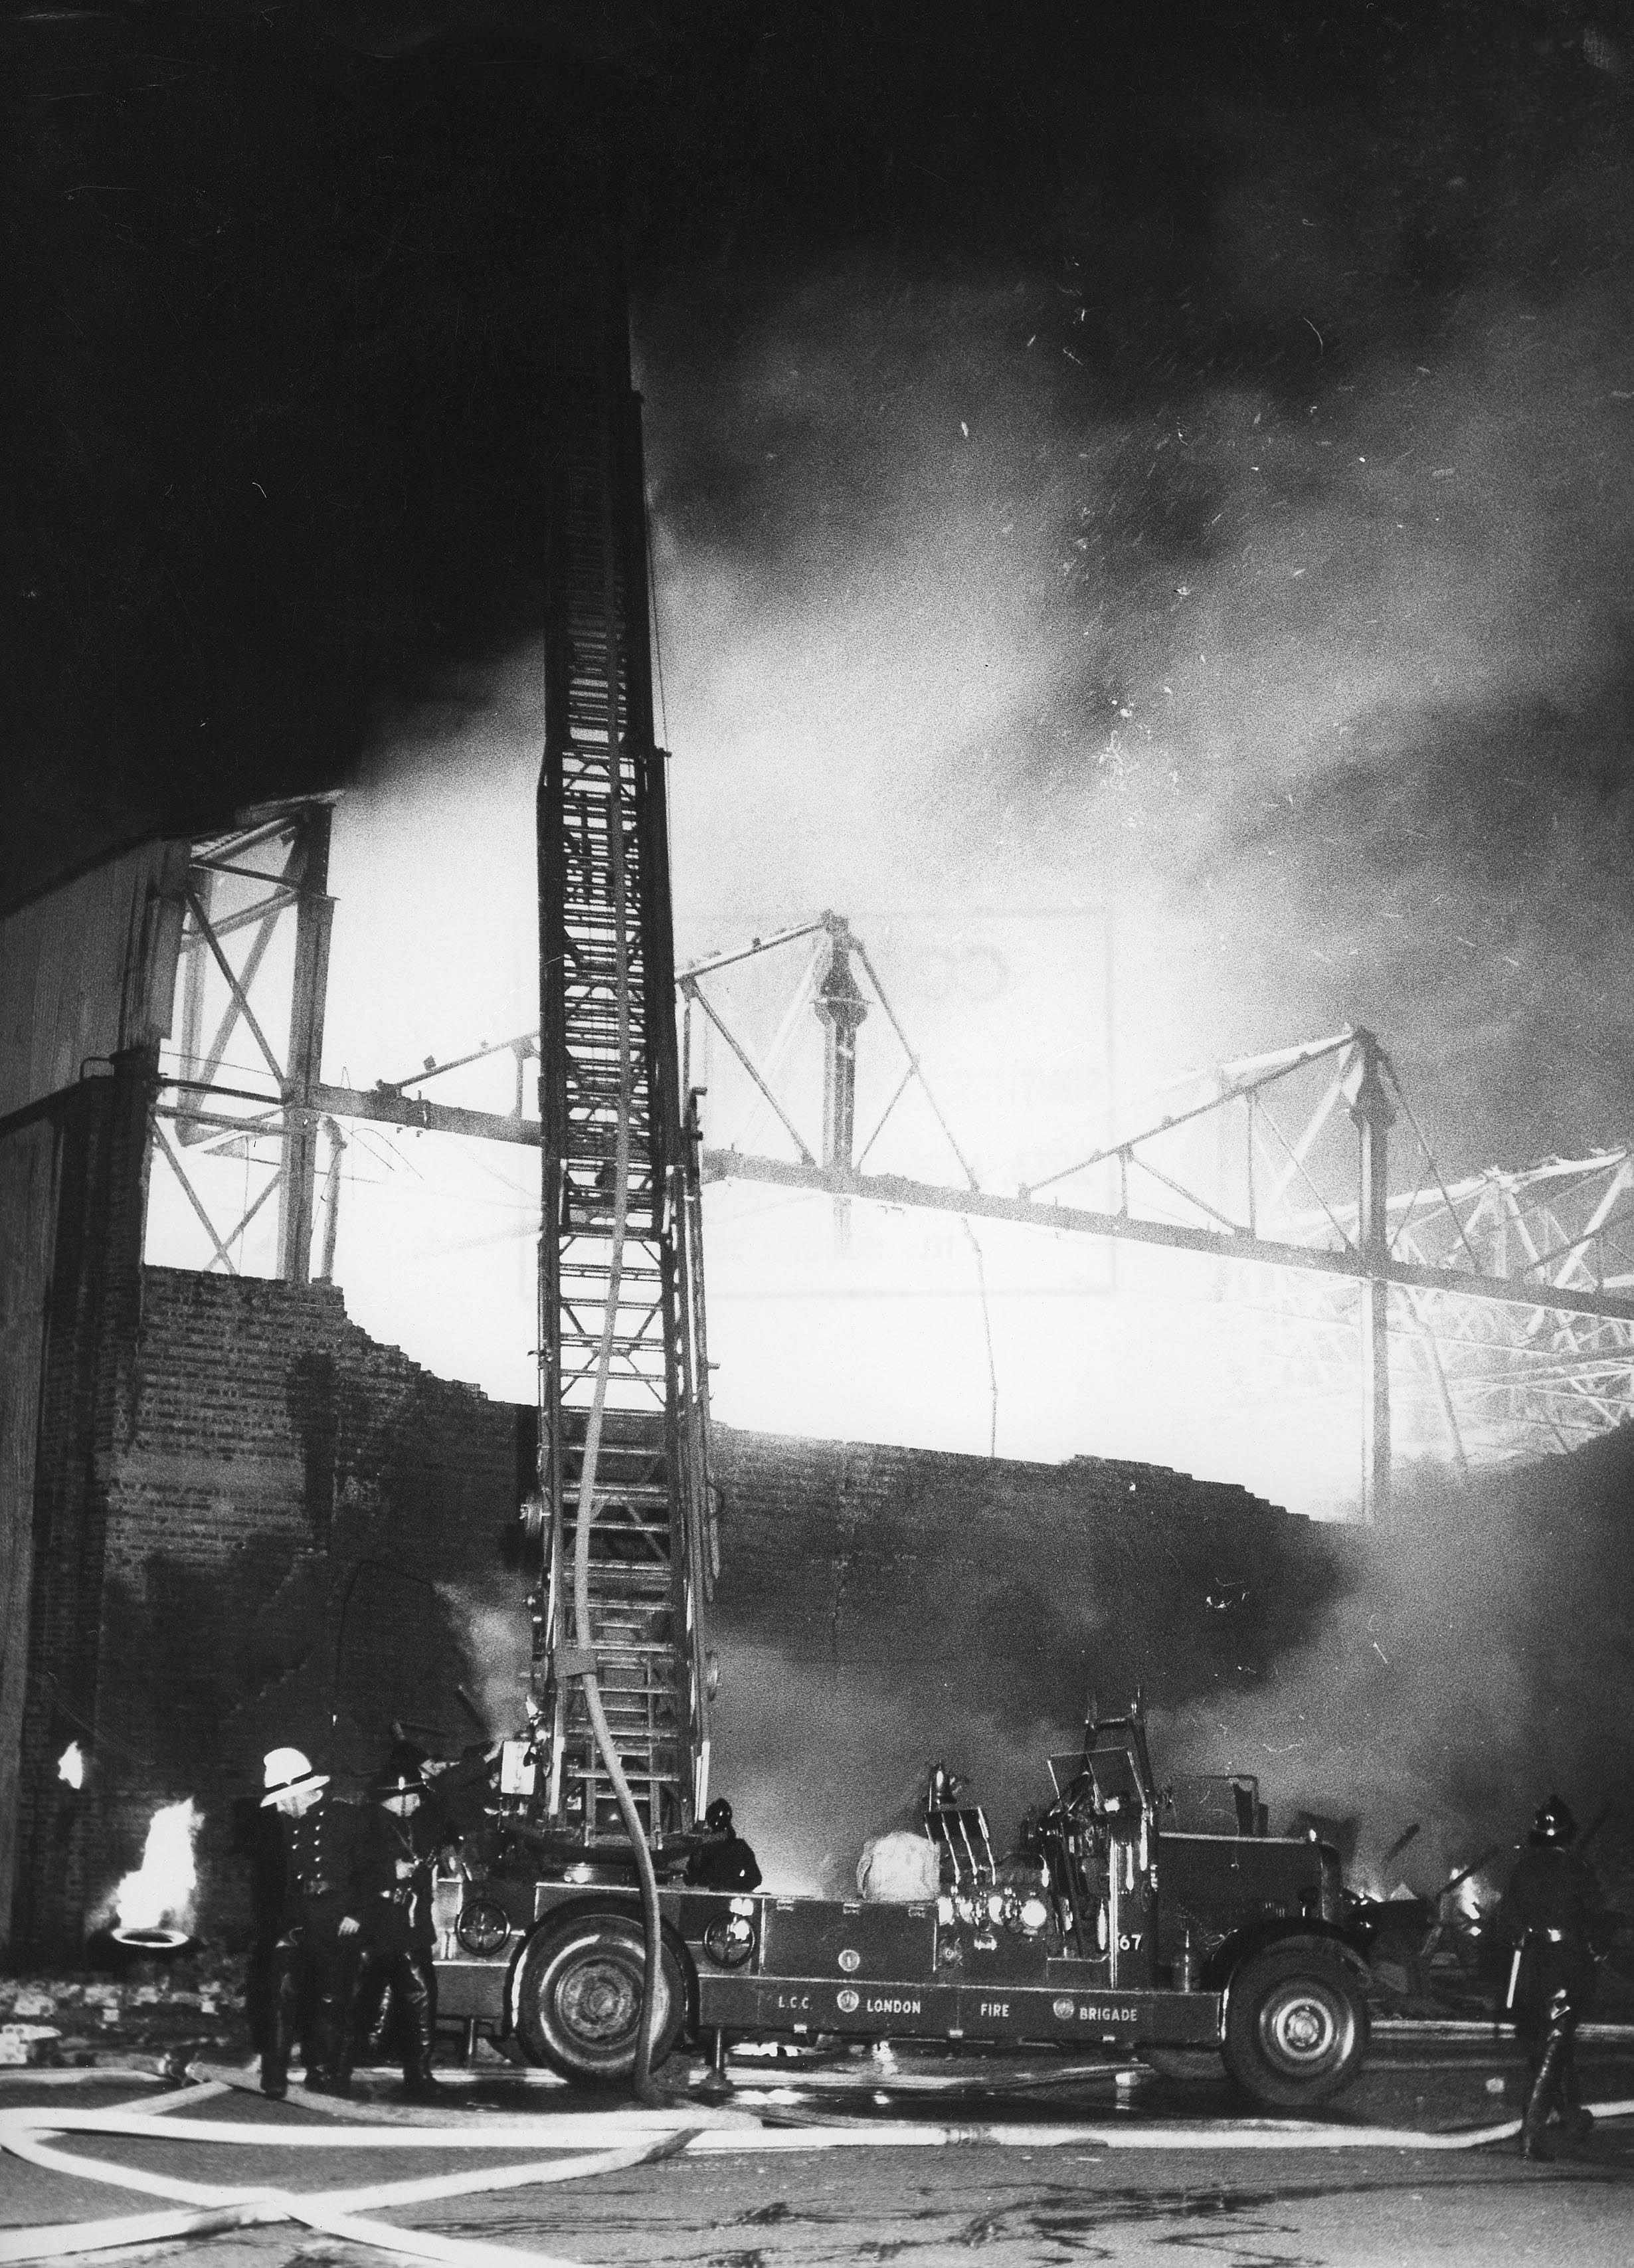 bowater croydon fire #1